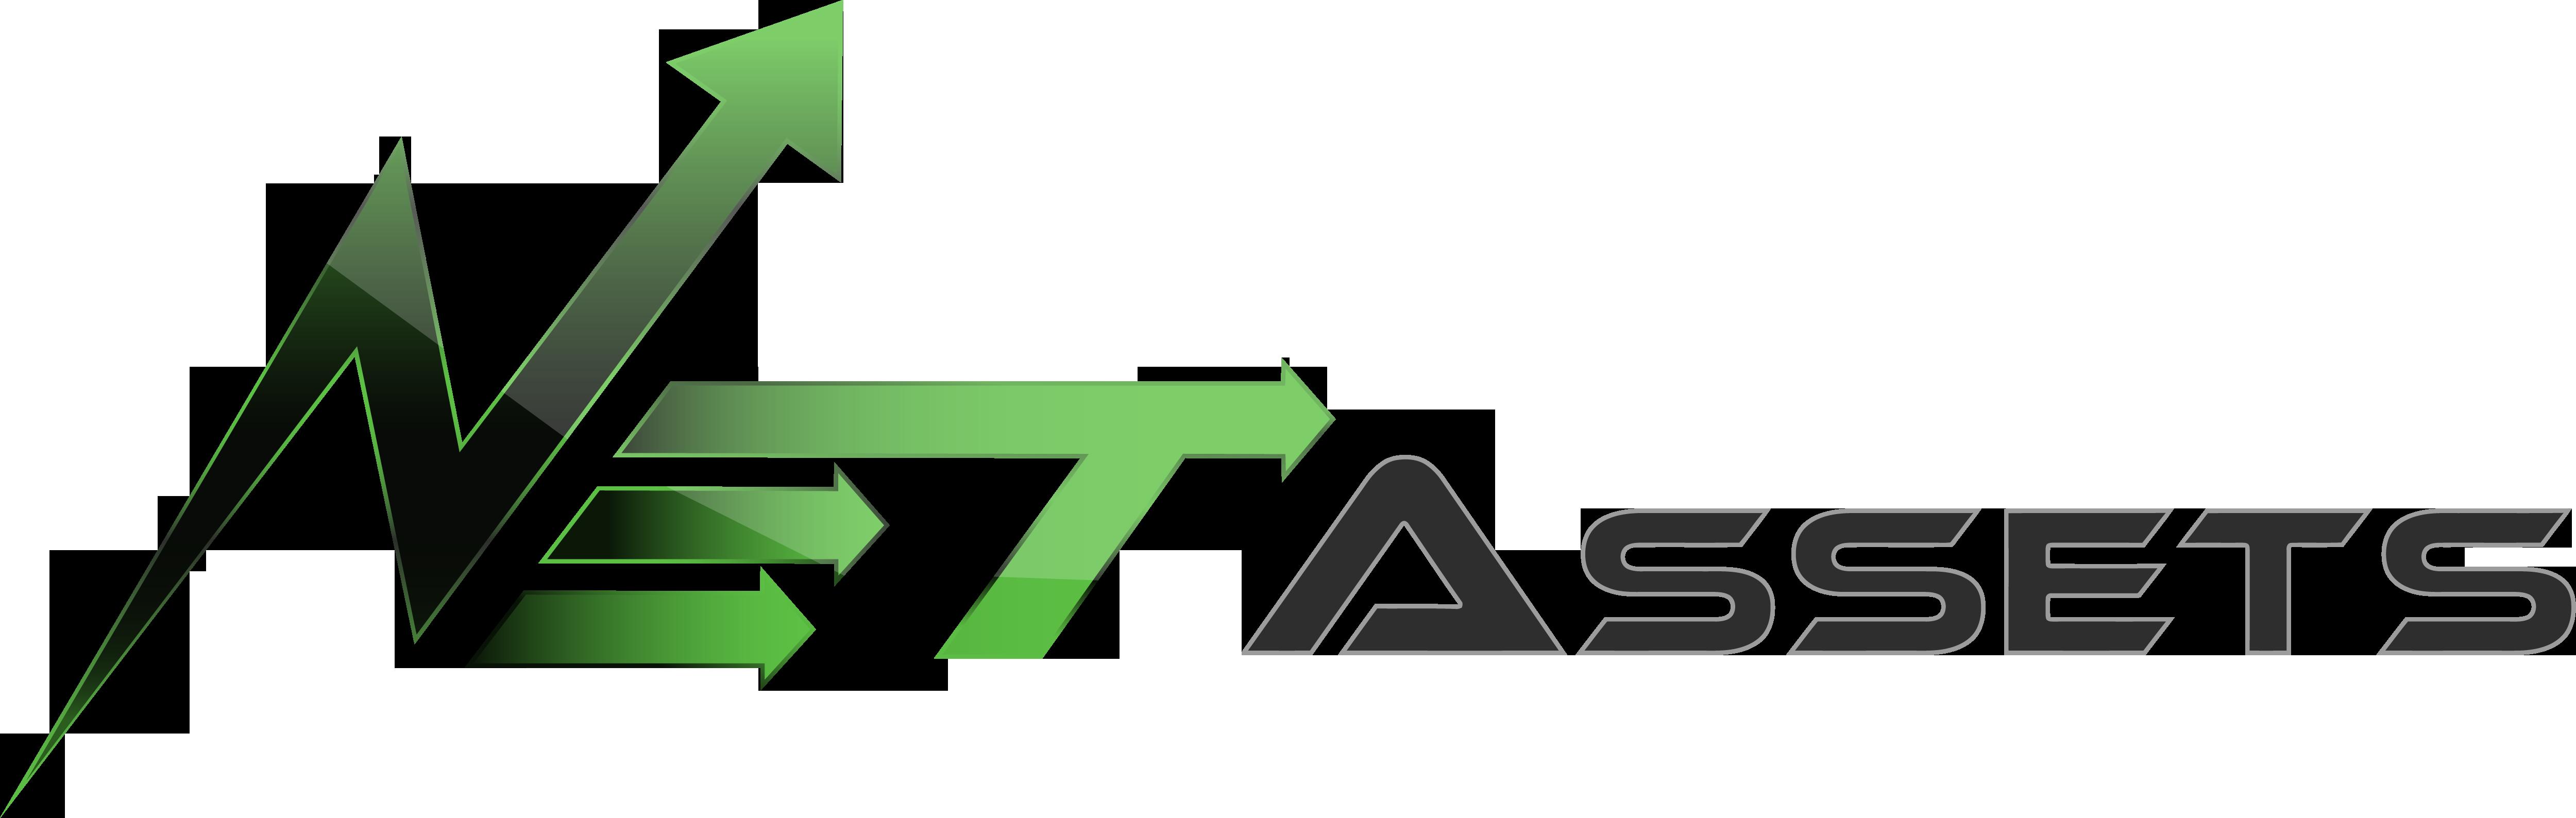 Net Assets Agency, a chatbot developer